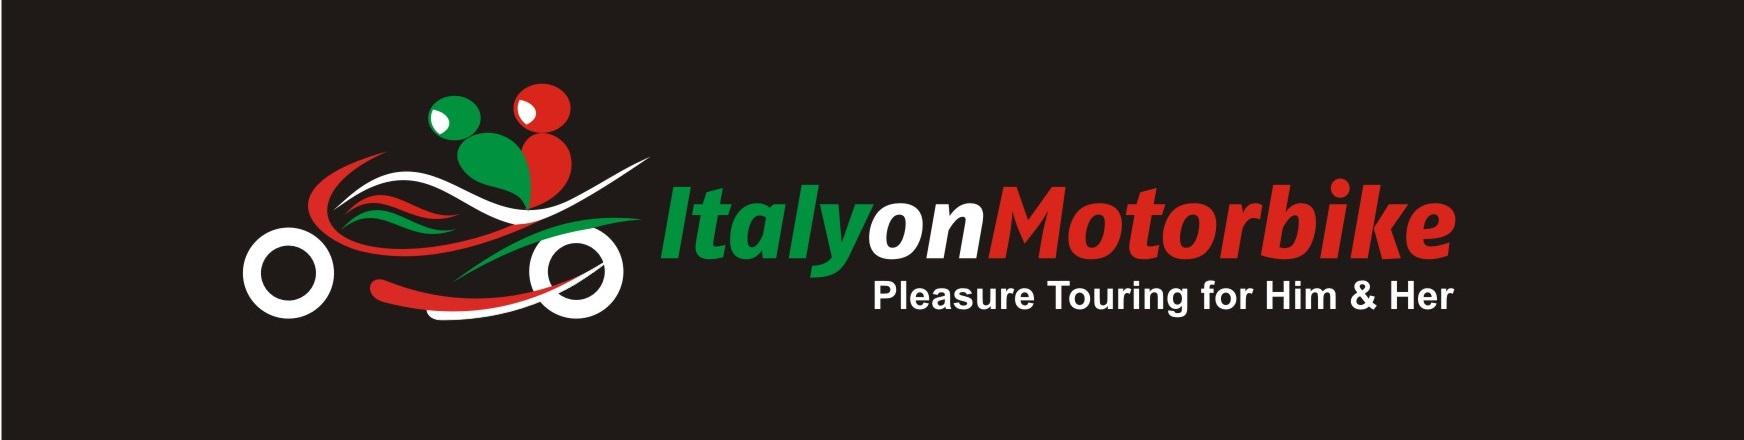 Italy On Motorbike